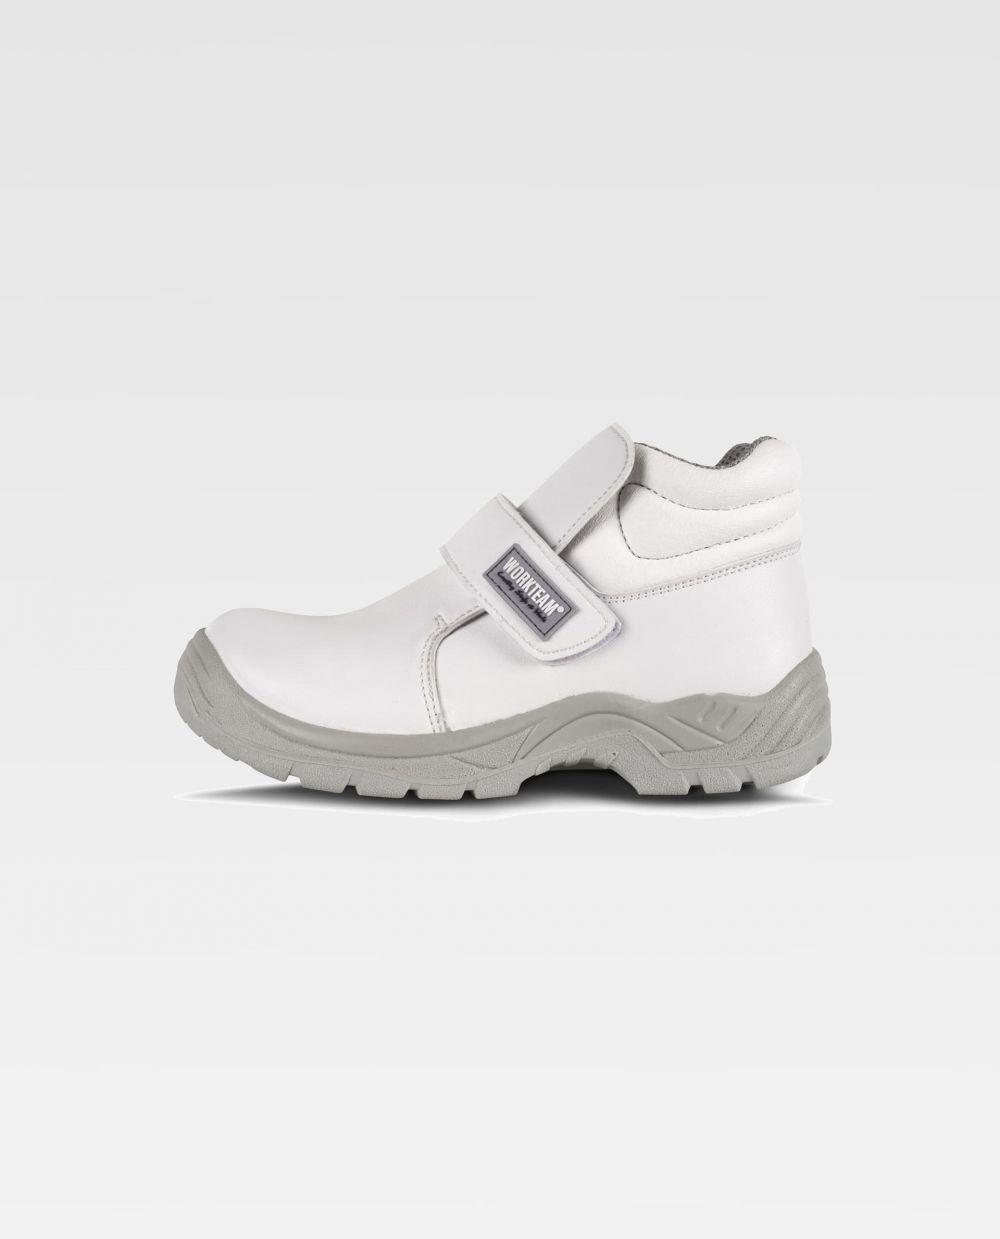 Zapatos de trabajo workteam bota p2102 de microfibra vista 1